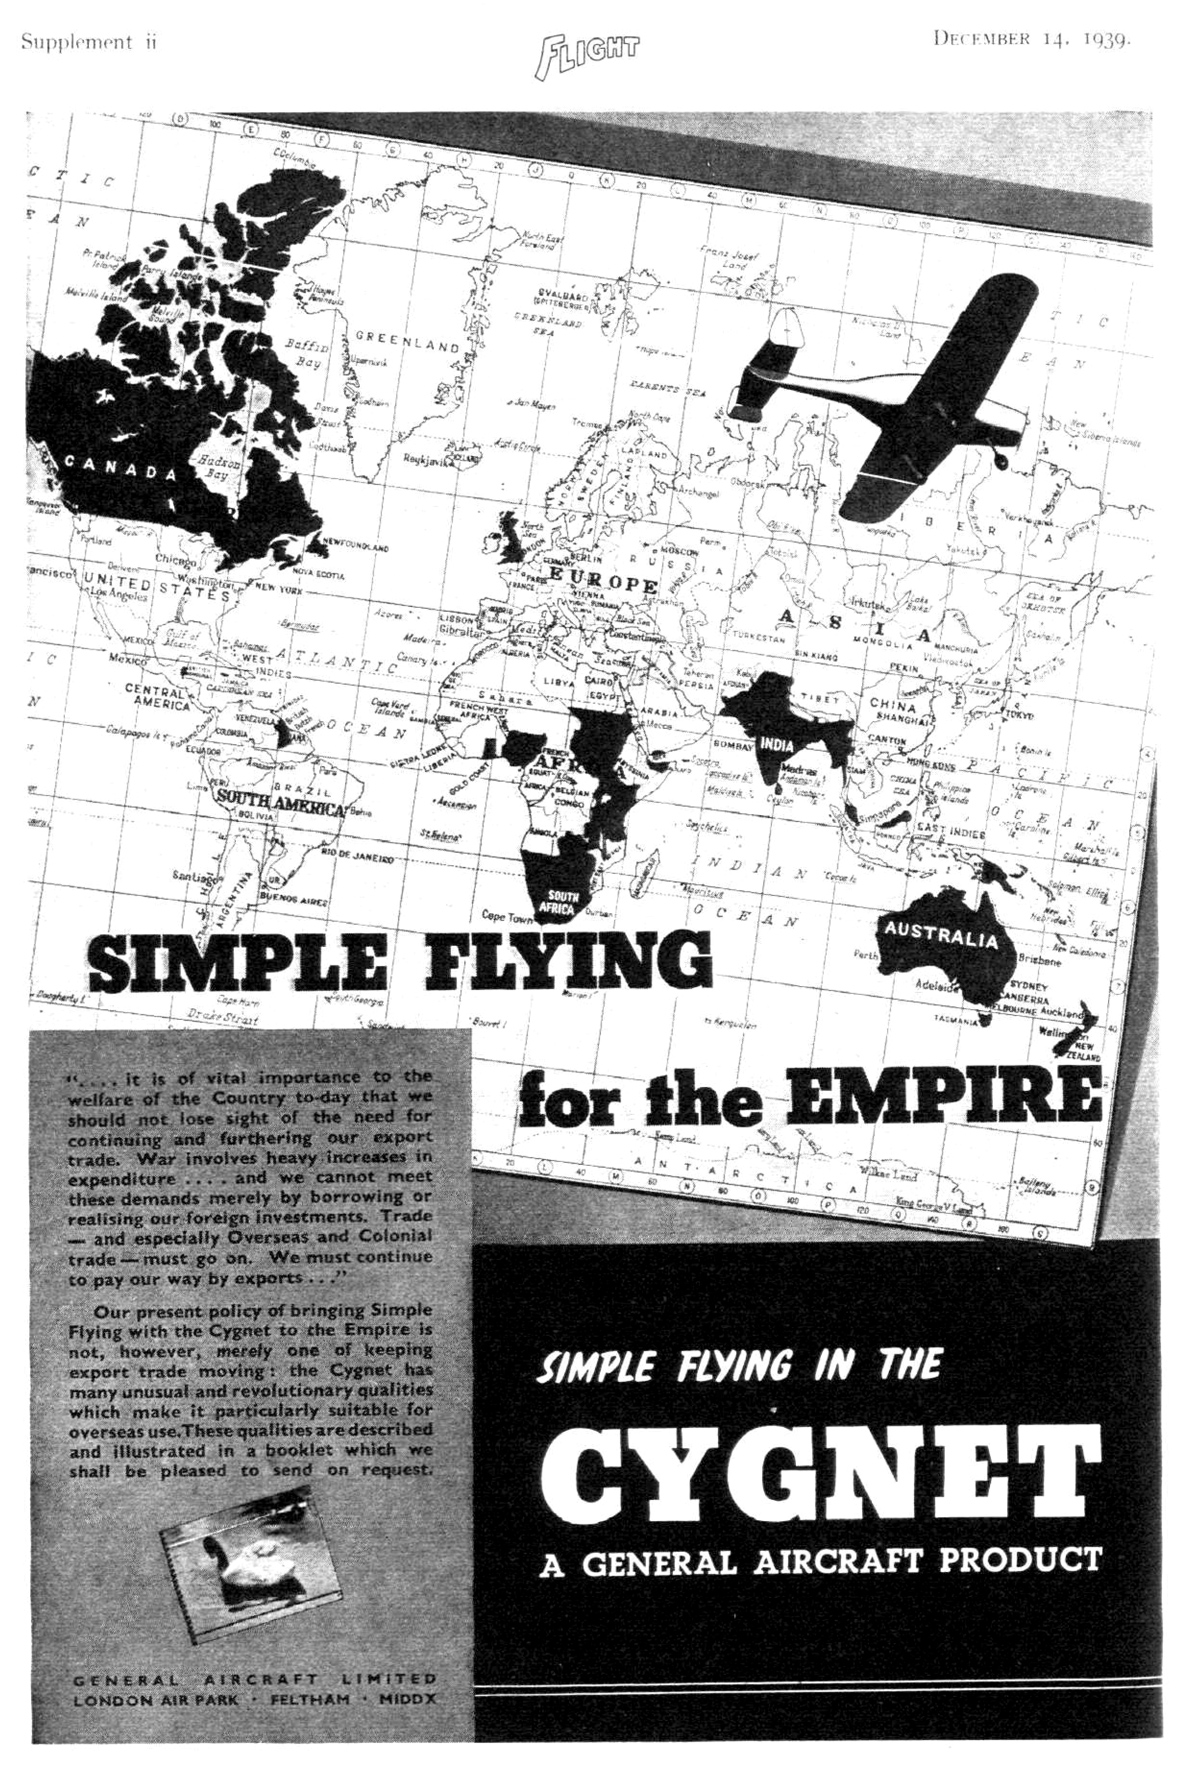 1939-12-14-general-aircraft-cygnet